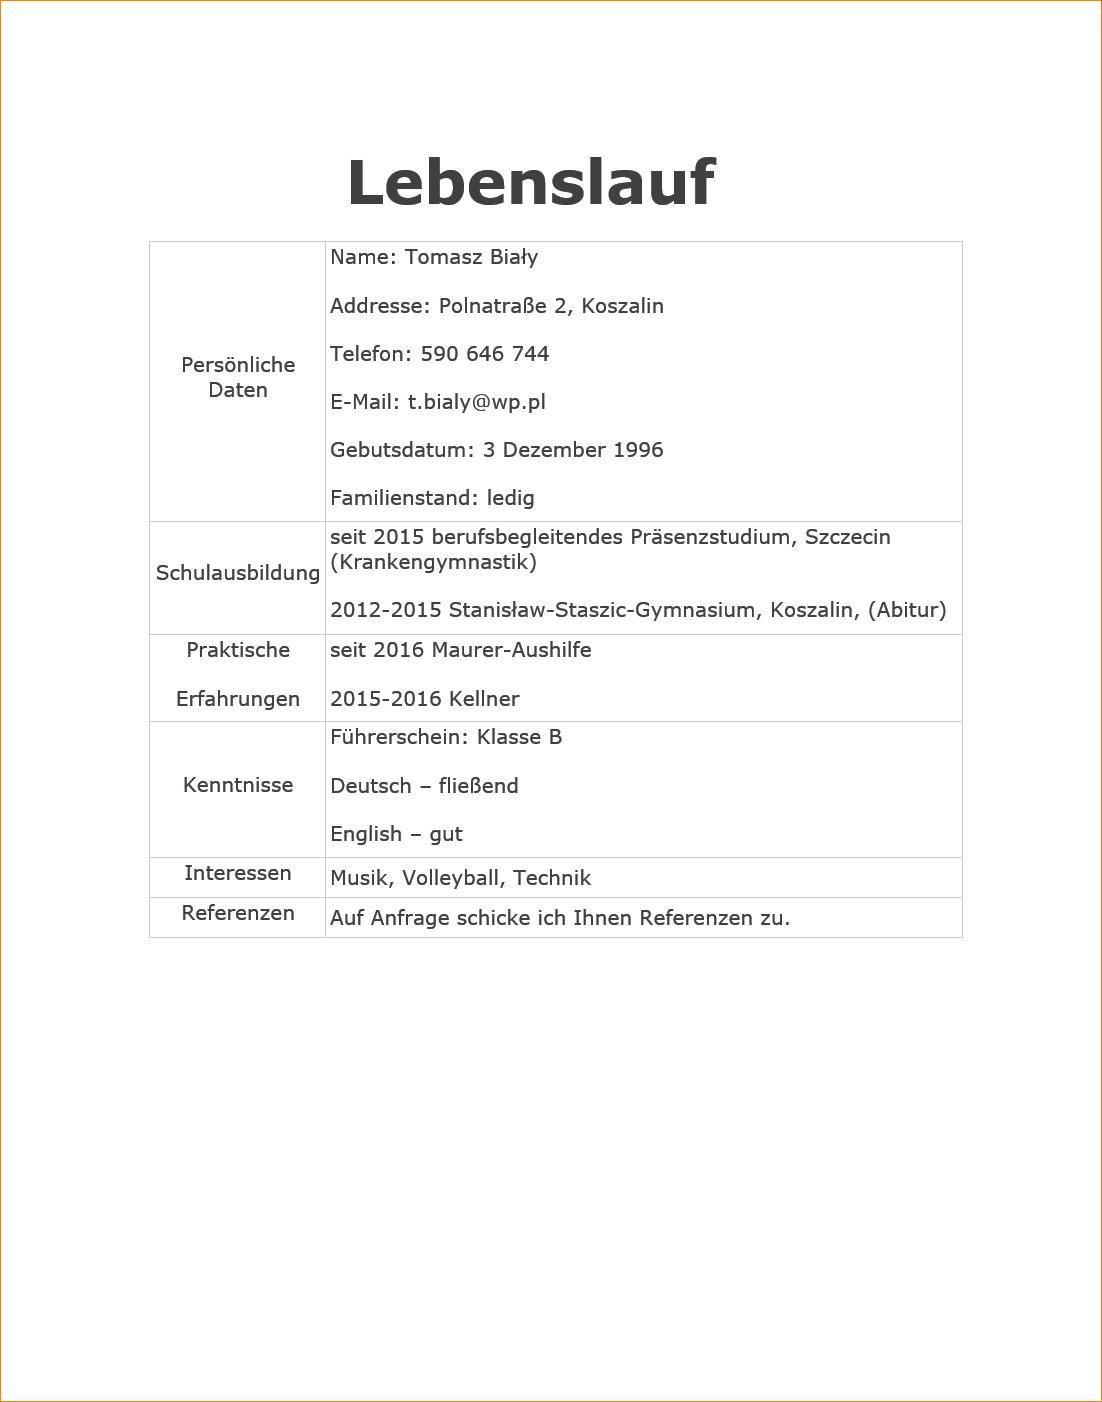 Mascha Und Der Bär Ausmalbild Genial Bewerbungs Deckblatt 2018 10 15t01 06 Fotos